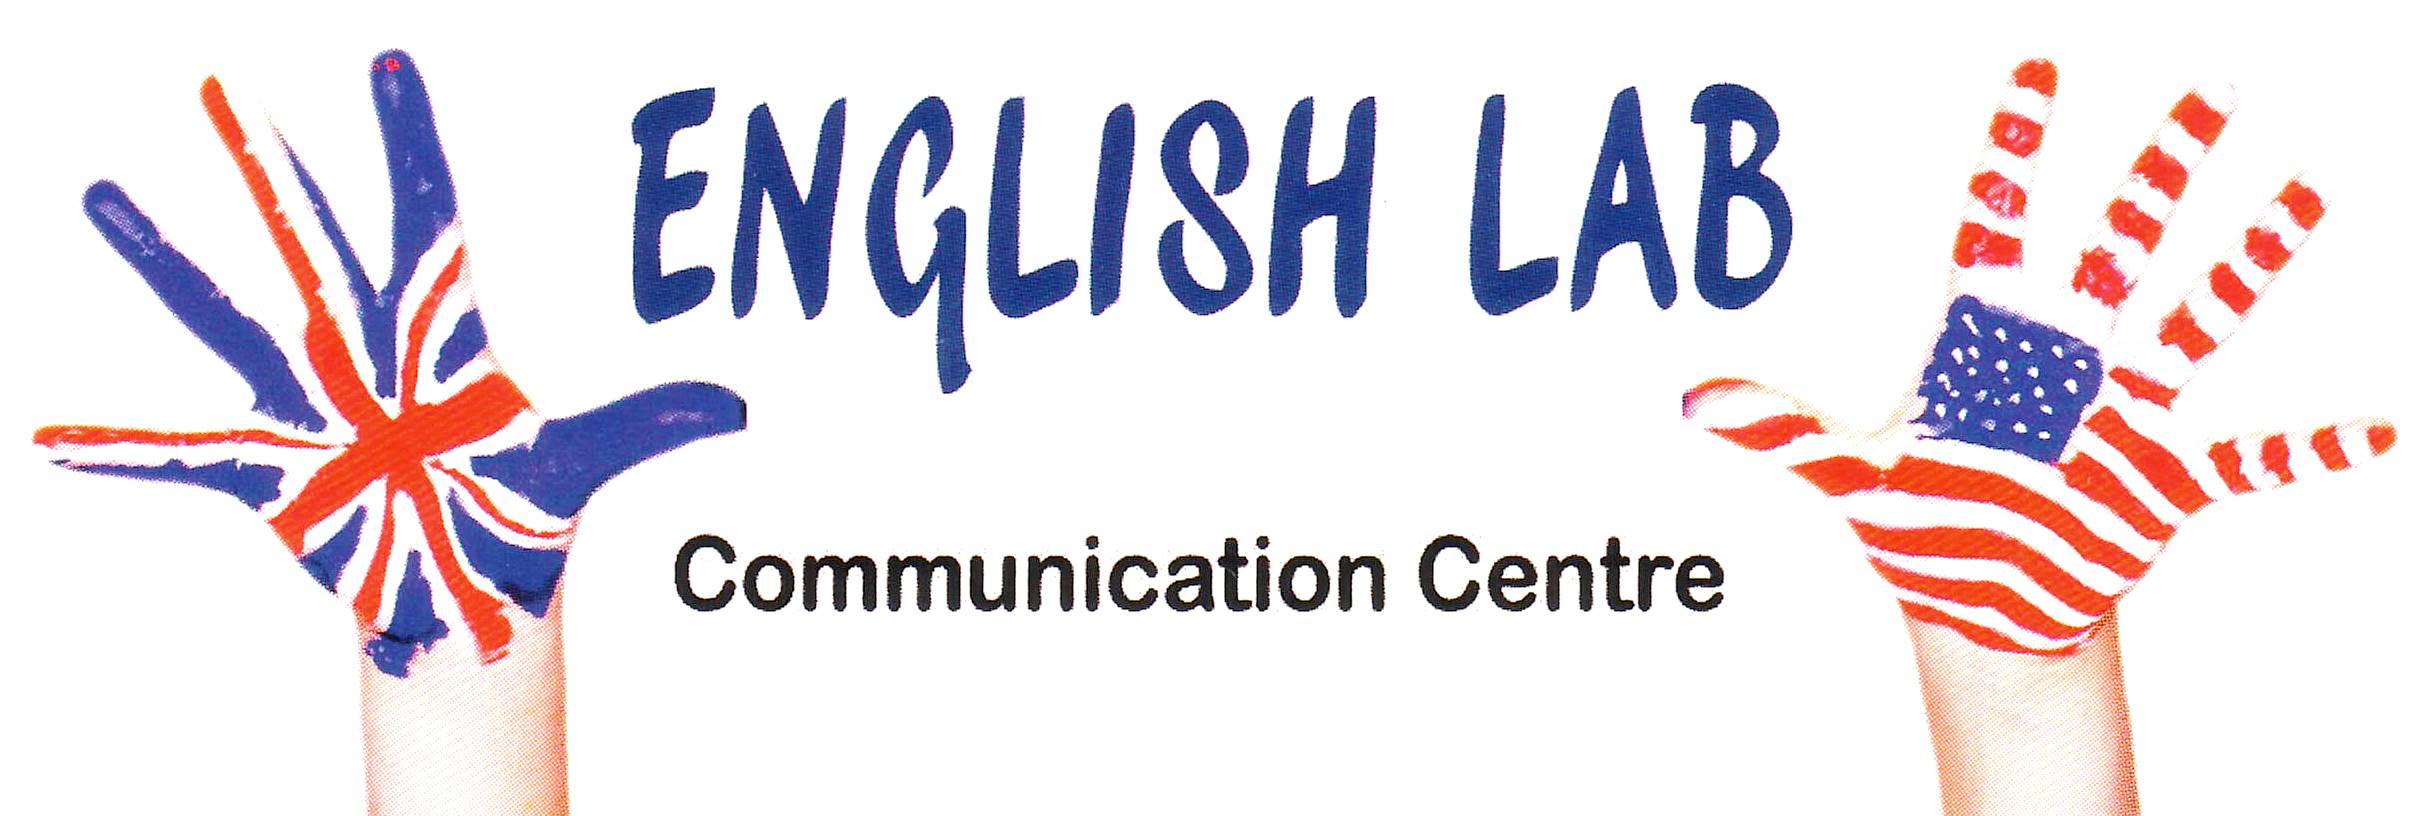 English Lab Academy